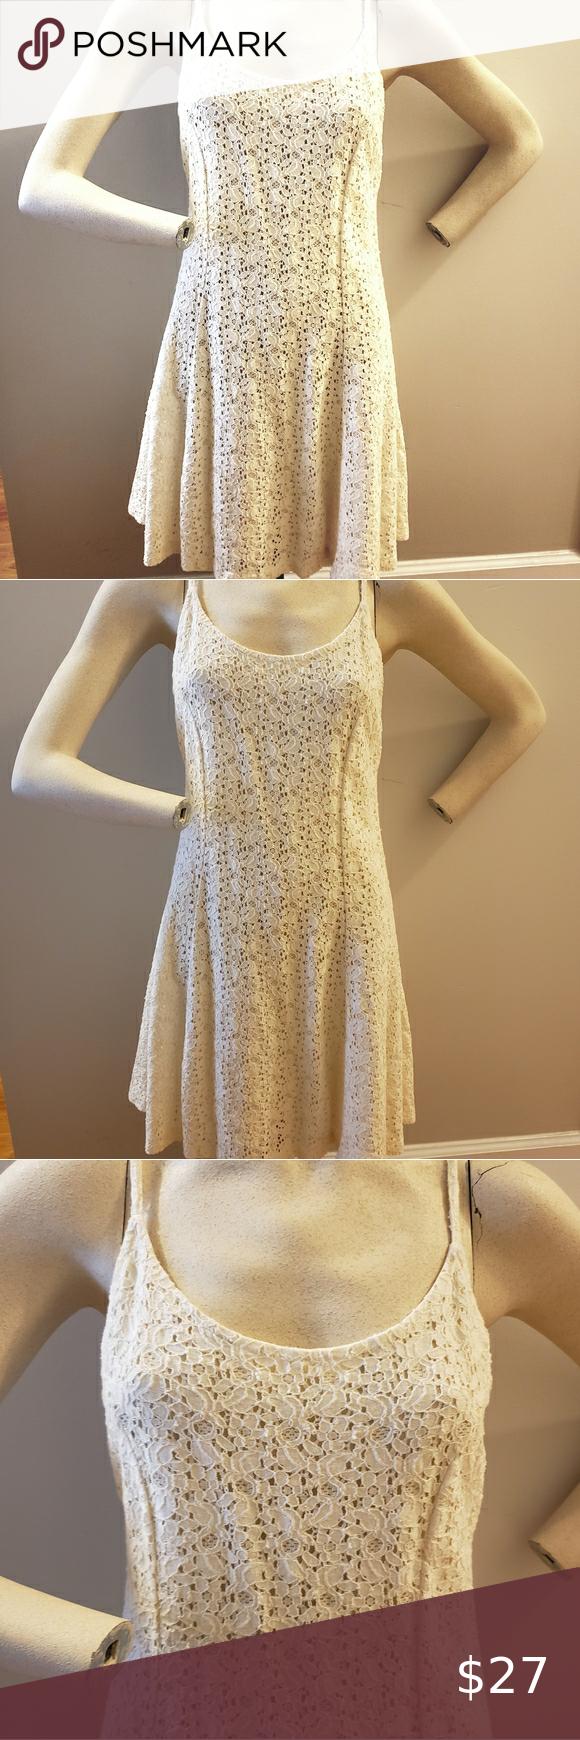 Vintage 90s Cream White Lace Skater Dress S White Lace Skater Dress Lace Skater Dress Skater Dress [ 1740 x 580 Pixel ]